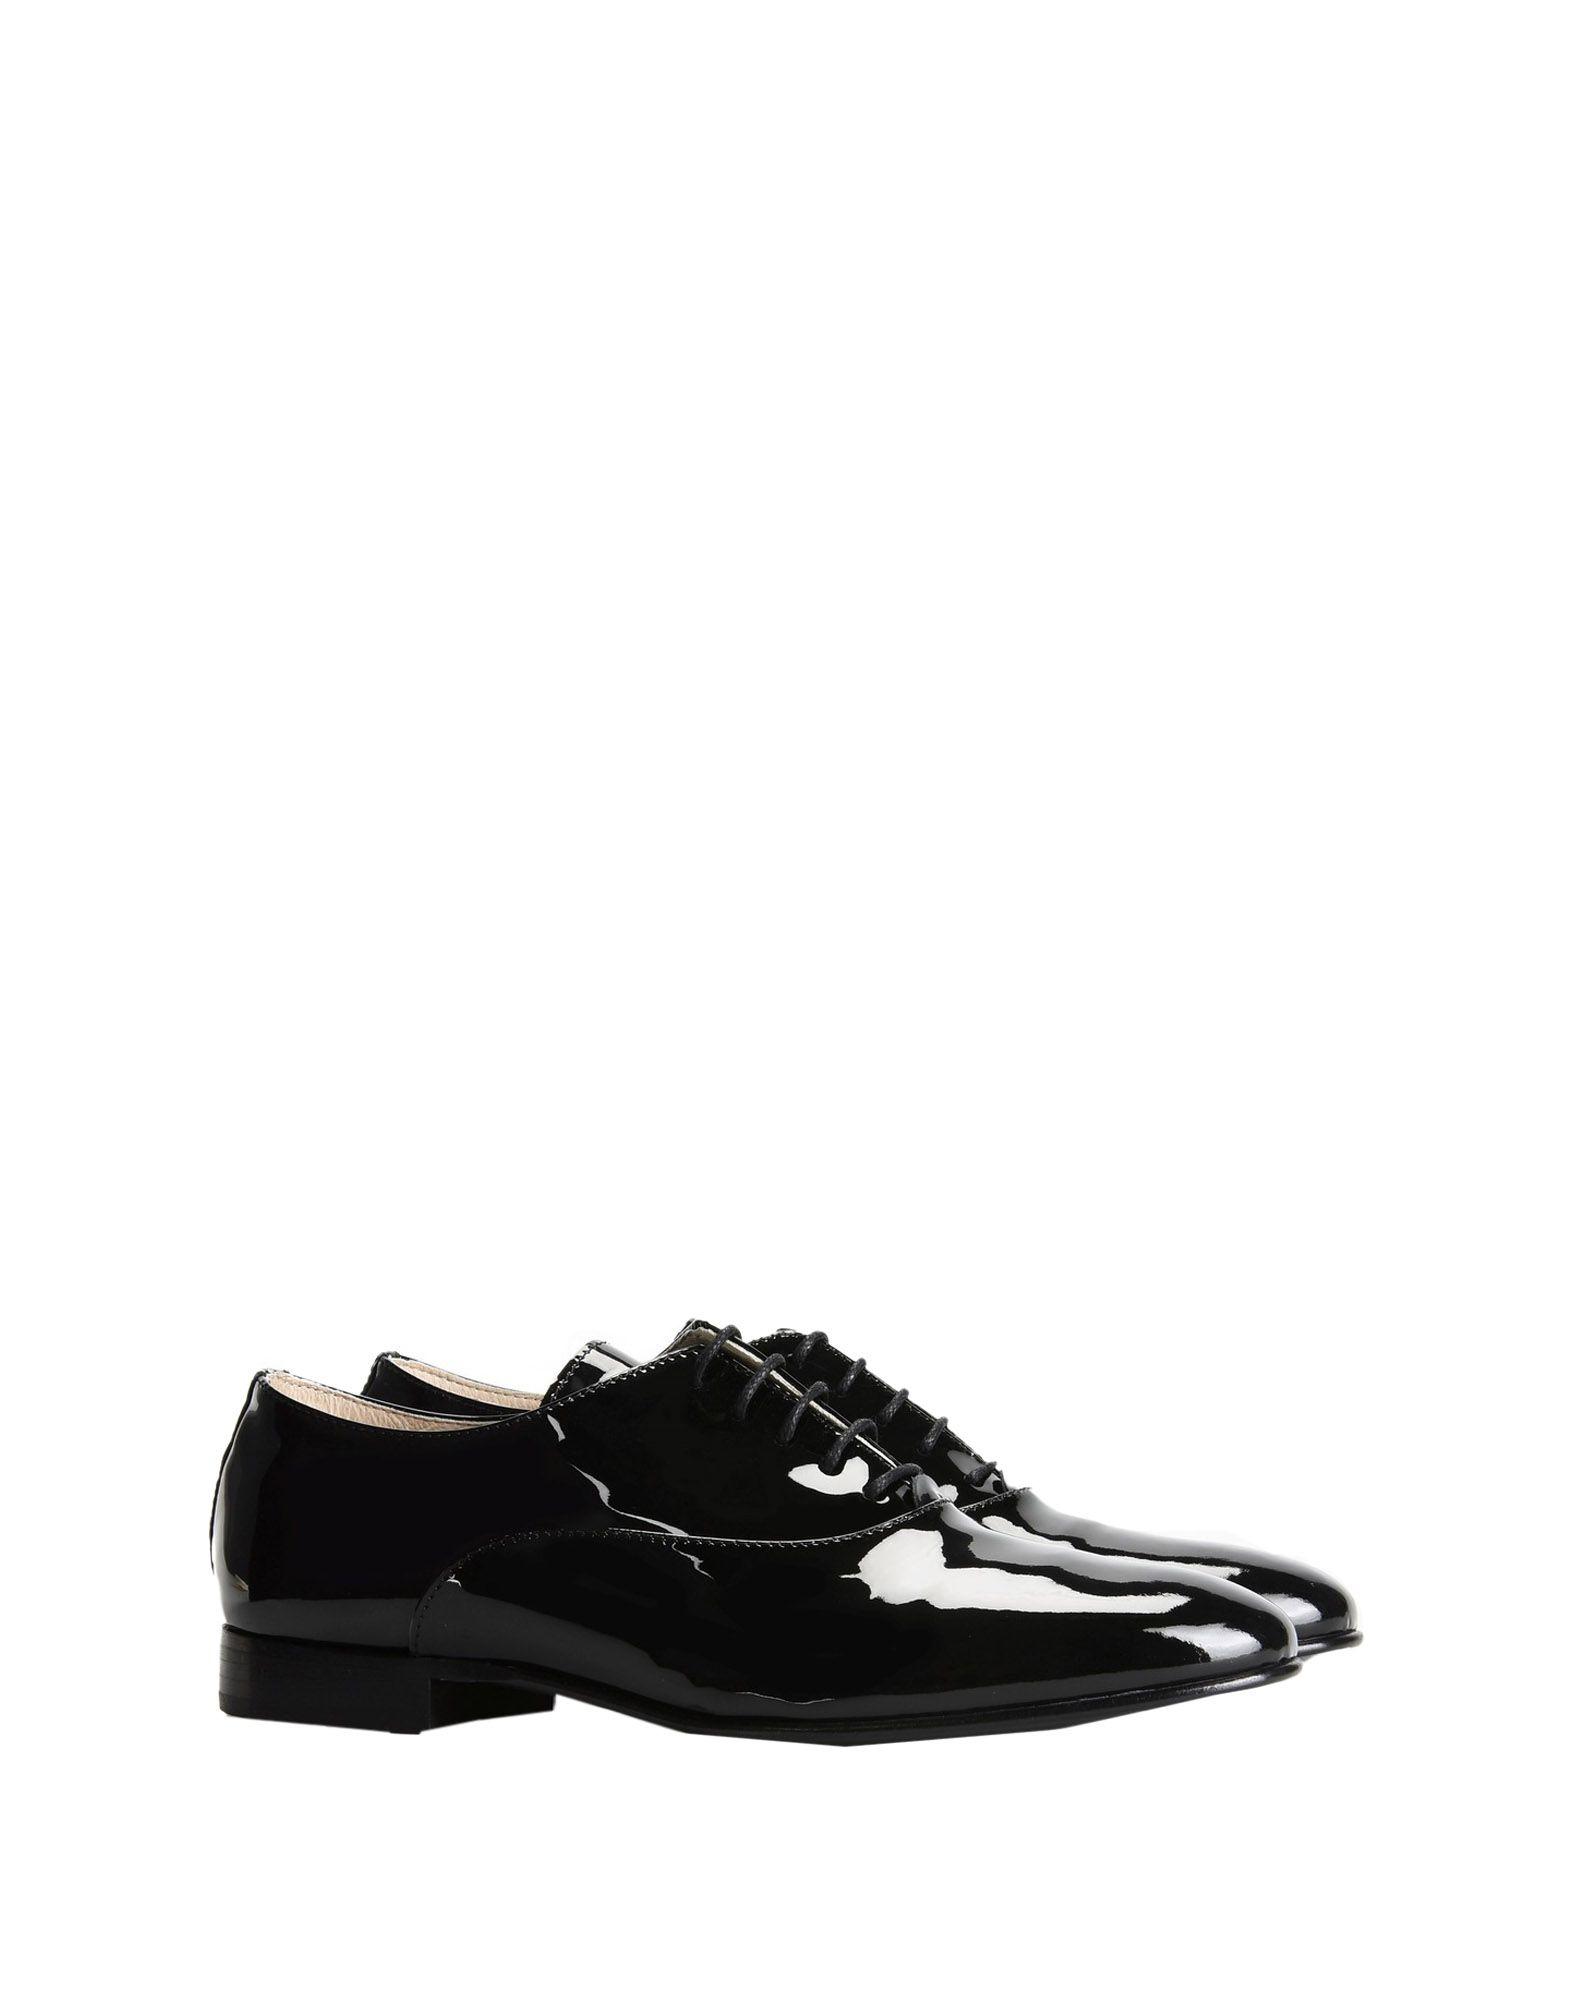 Leonardo Principi Schnürschuhe Damen  11221942CS Gute Qualität beliebte Schuhe